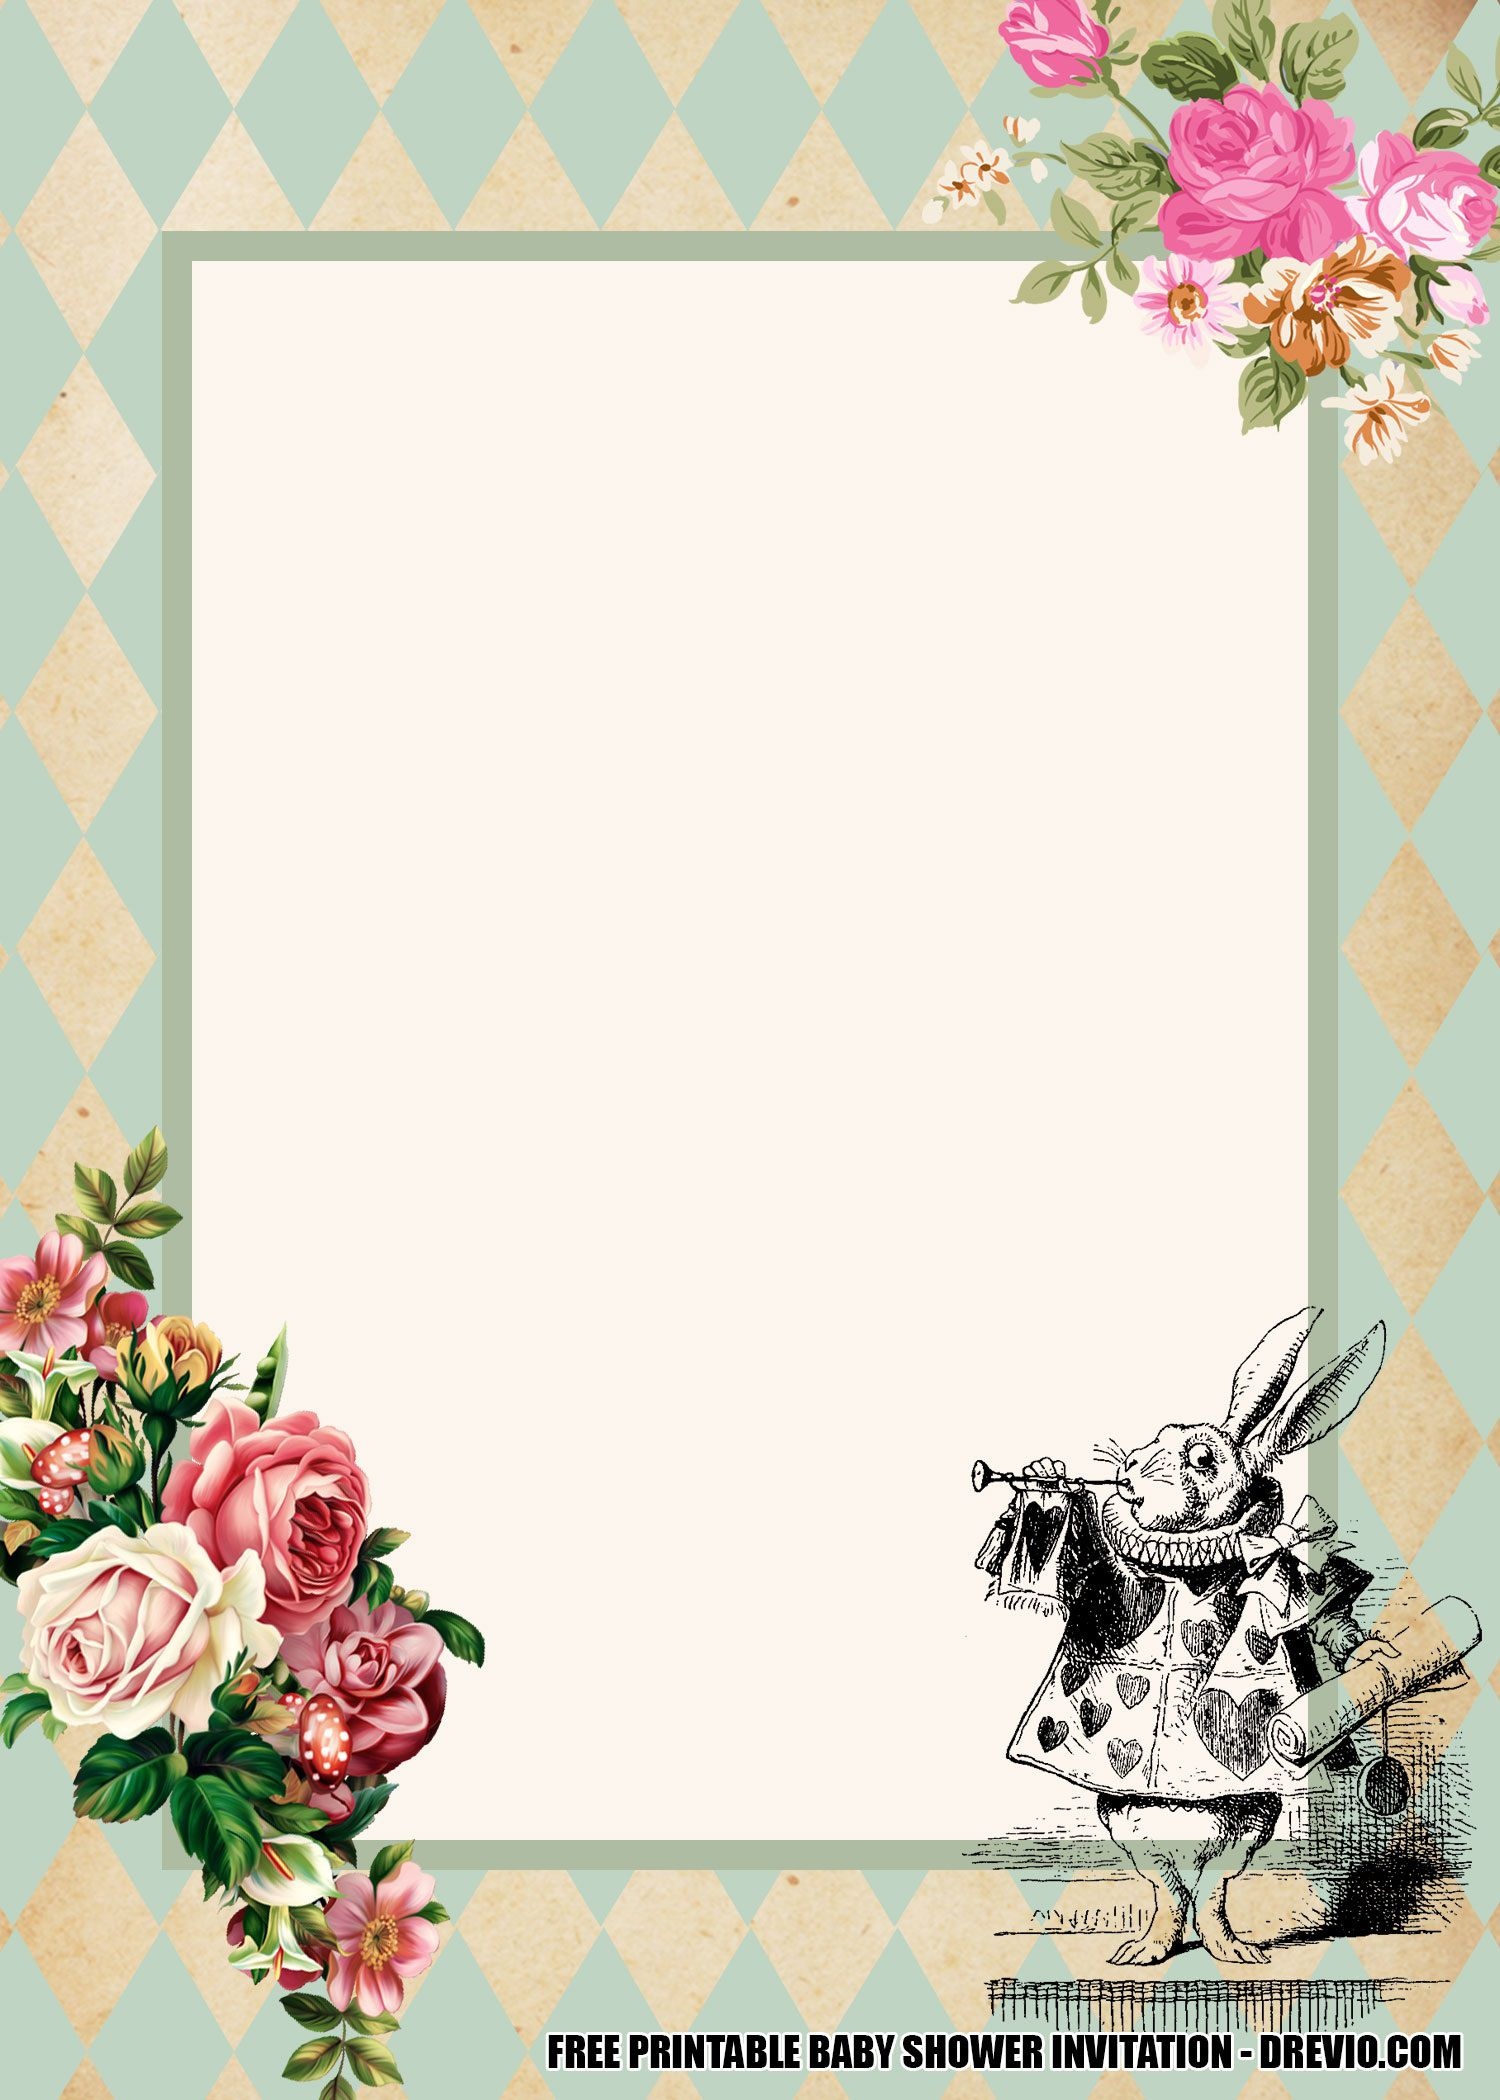 006 Unusual Alice In Wonderland Invitation Template Image  Templates Wedding Birthday Free Tea PartyFull